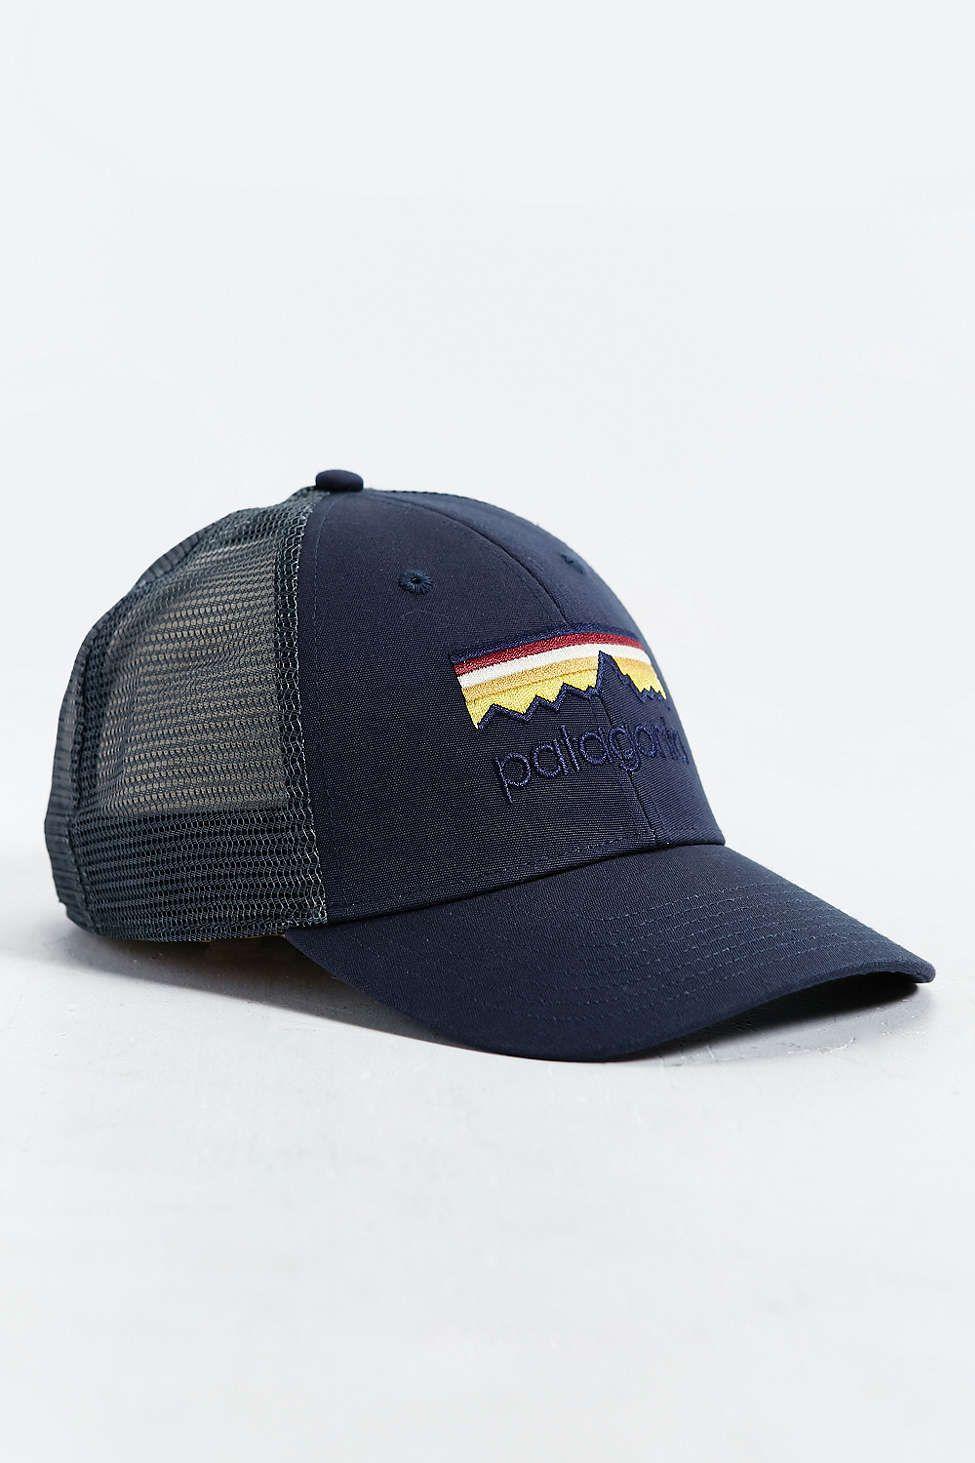 Patagonia Line Logo Lo-Pro Trucker Hat  870f995599a